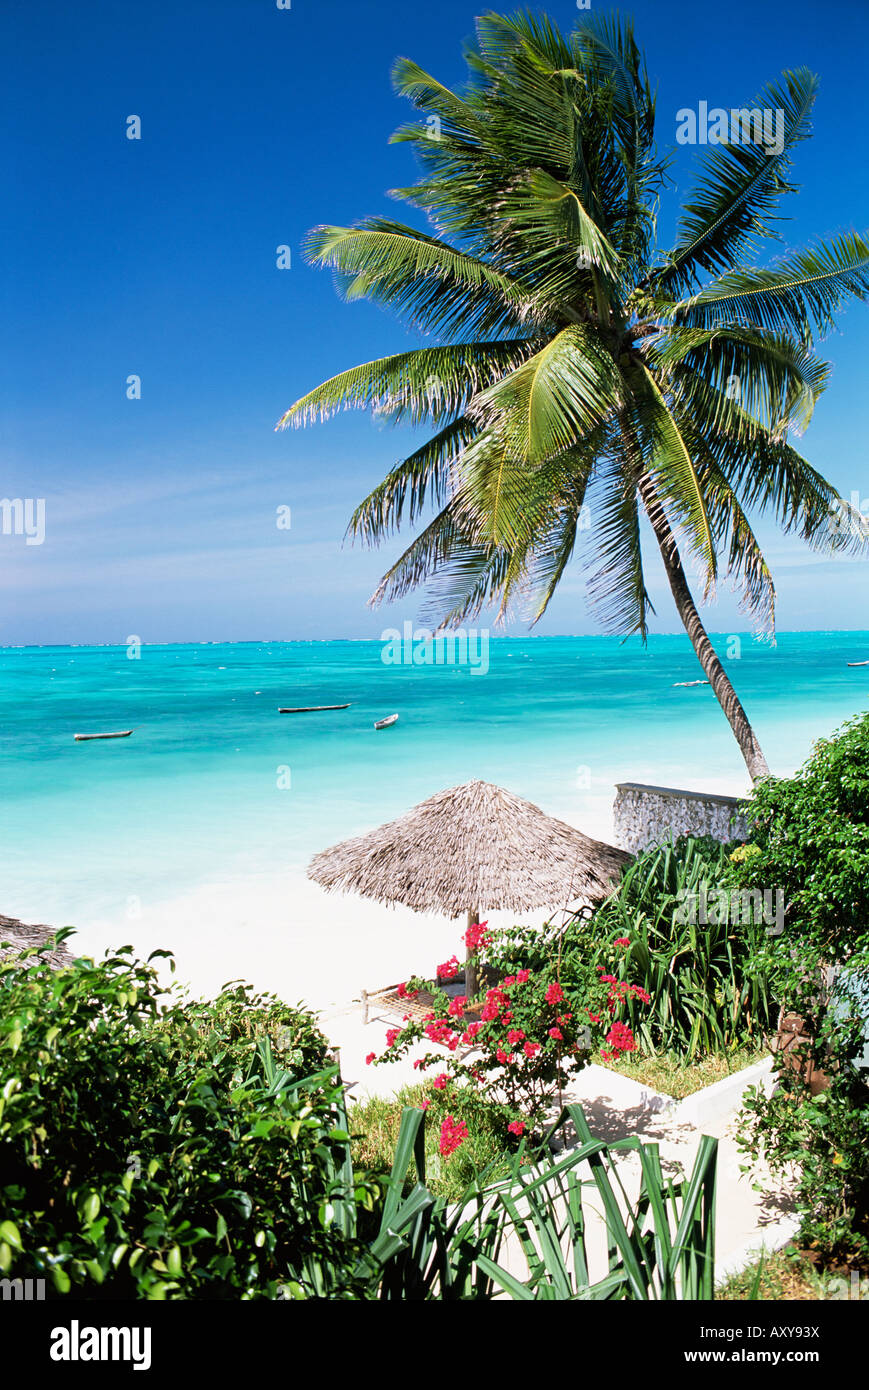 View through palm trees towards beach and Indian Ocean, Jambiani, island of Zanzibar, Tanzania, East Africa, Africa - Stock Image